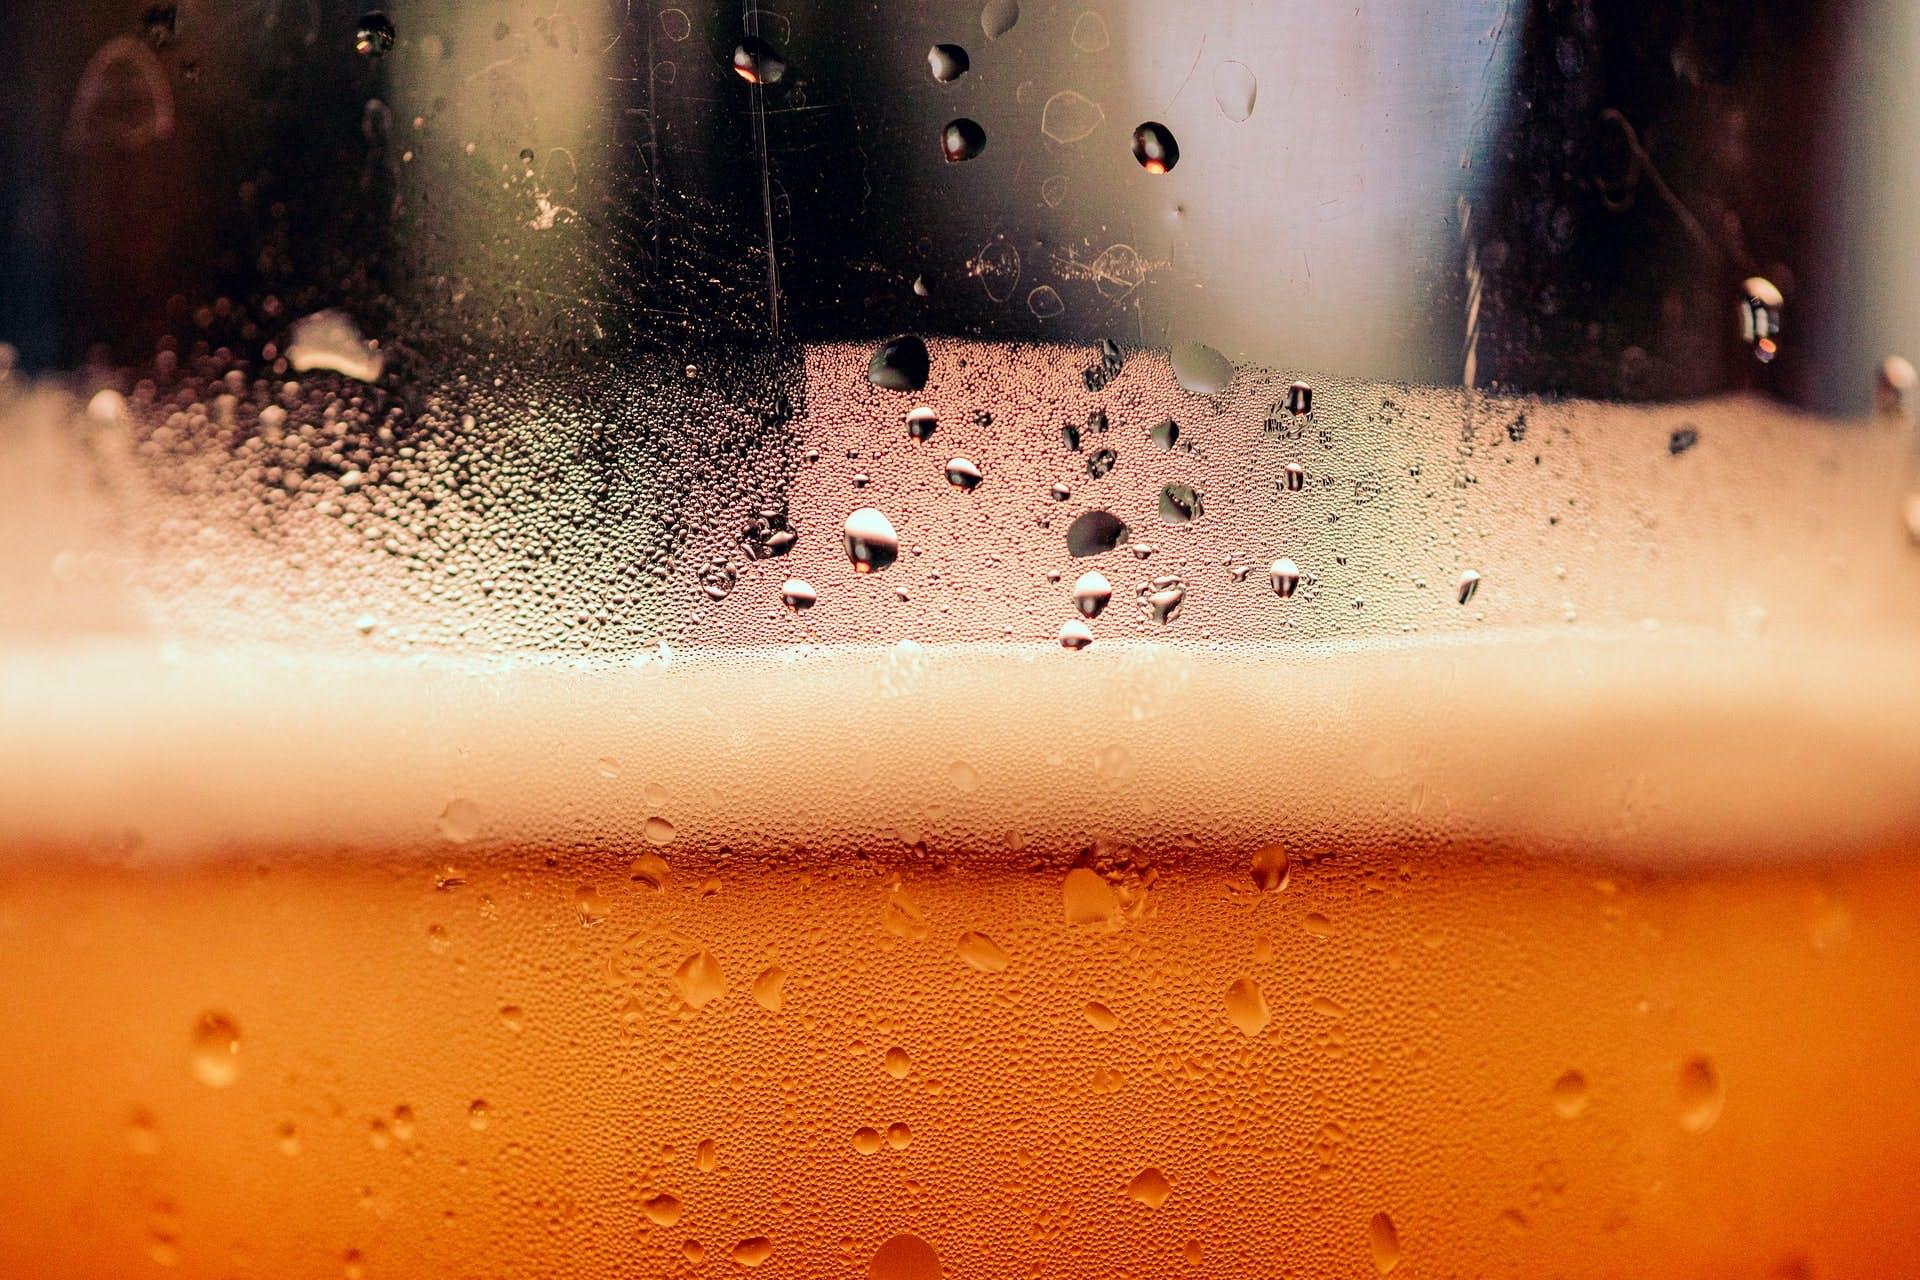 up close pint glass